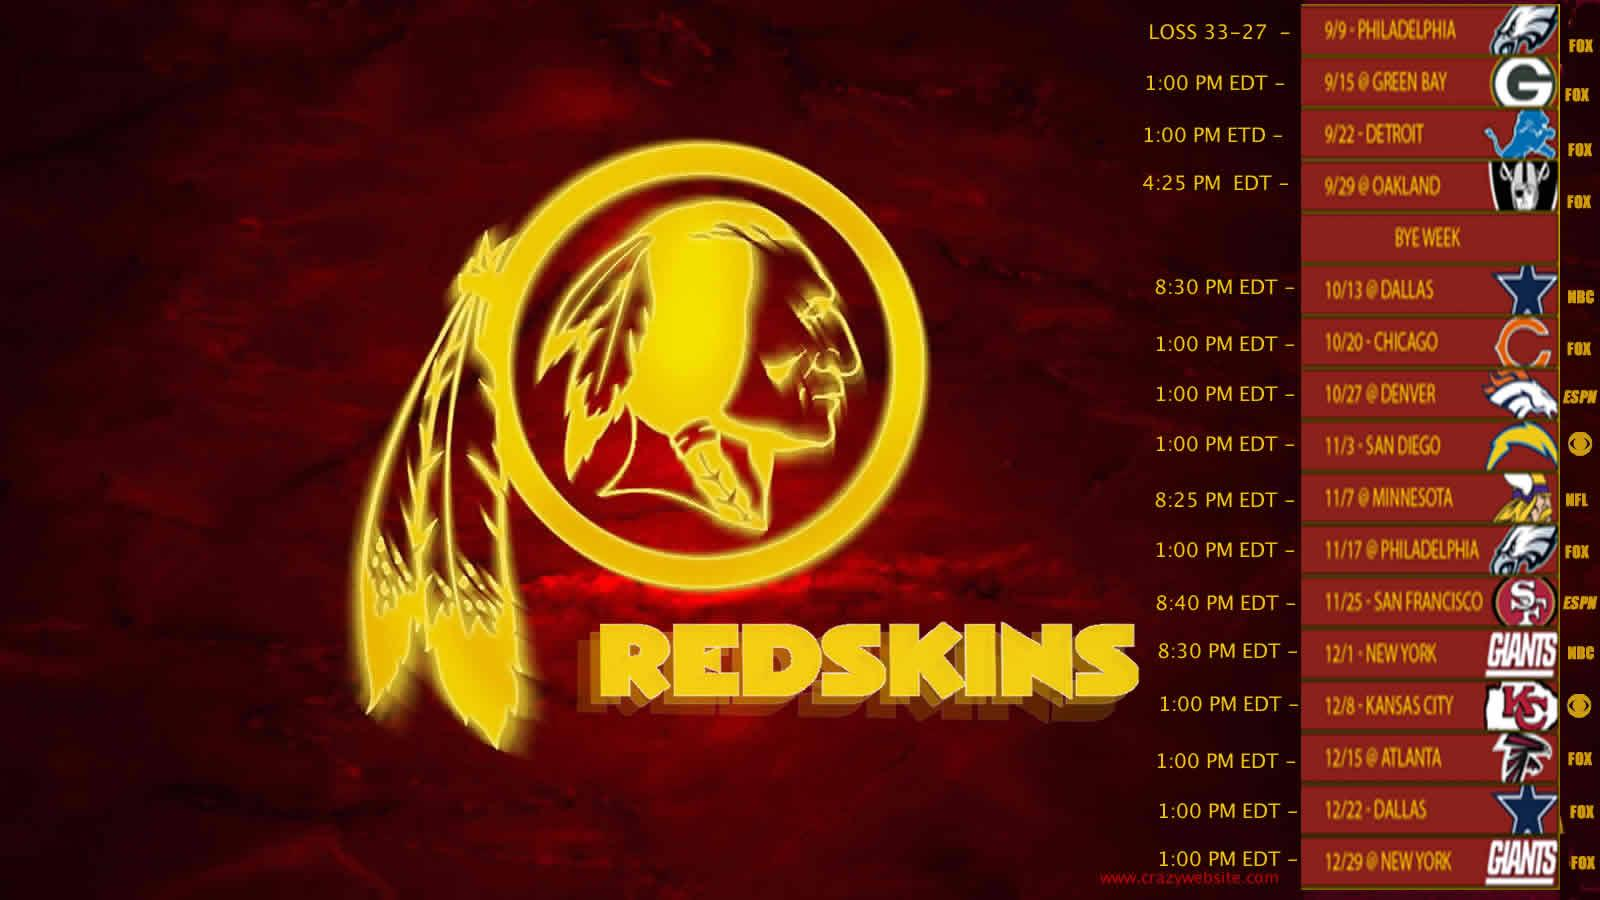 Redskins Wallpapers 2015 Wallpaper Cave